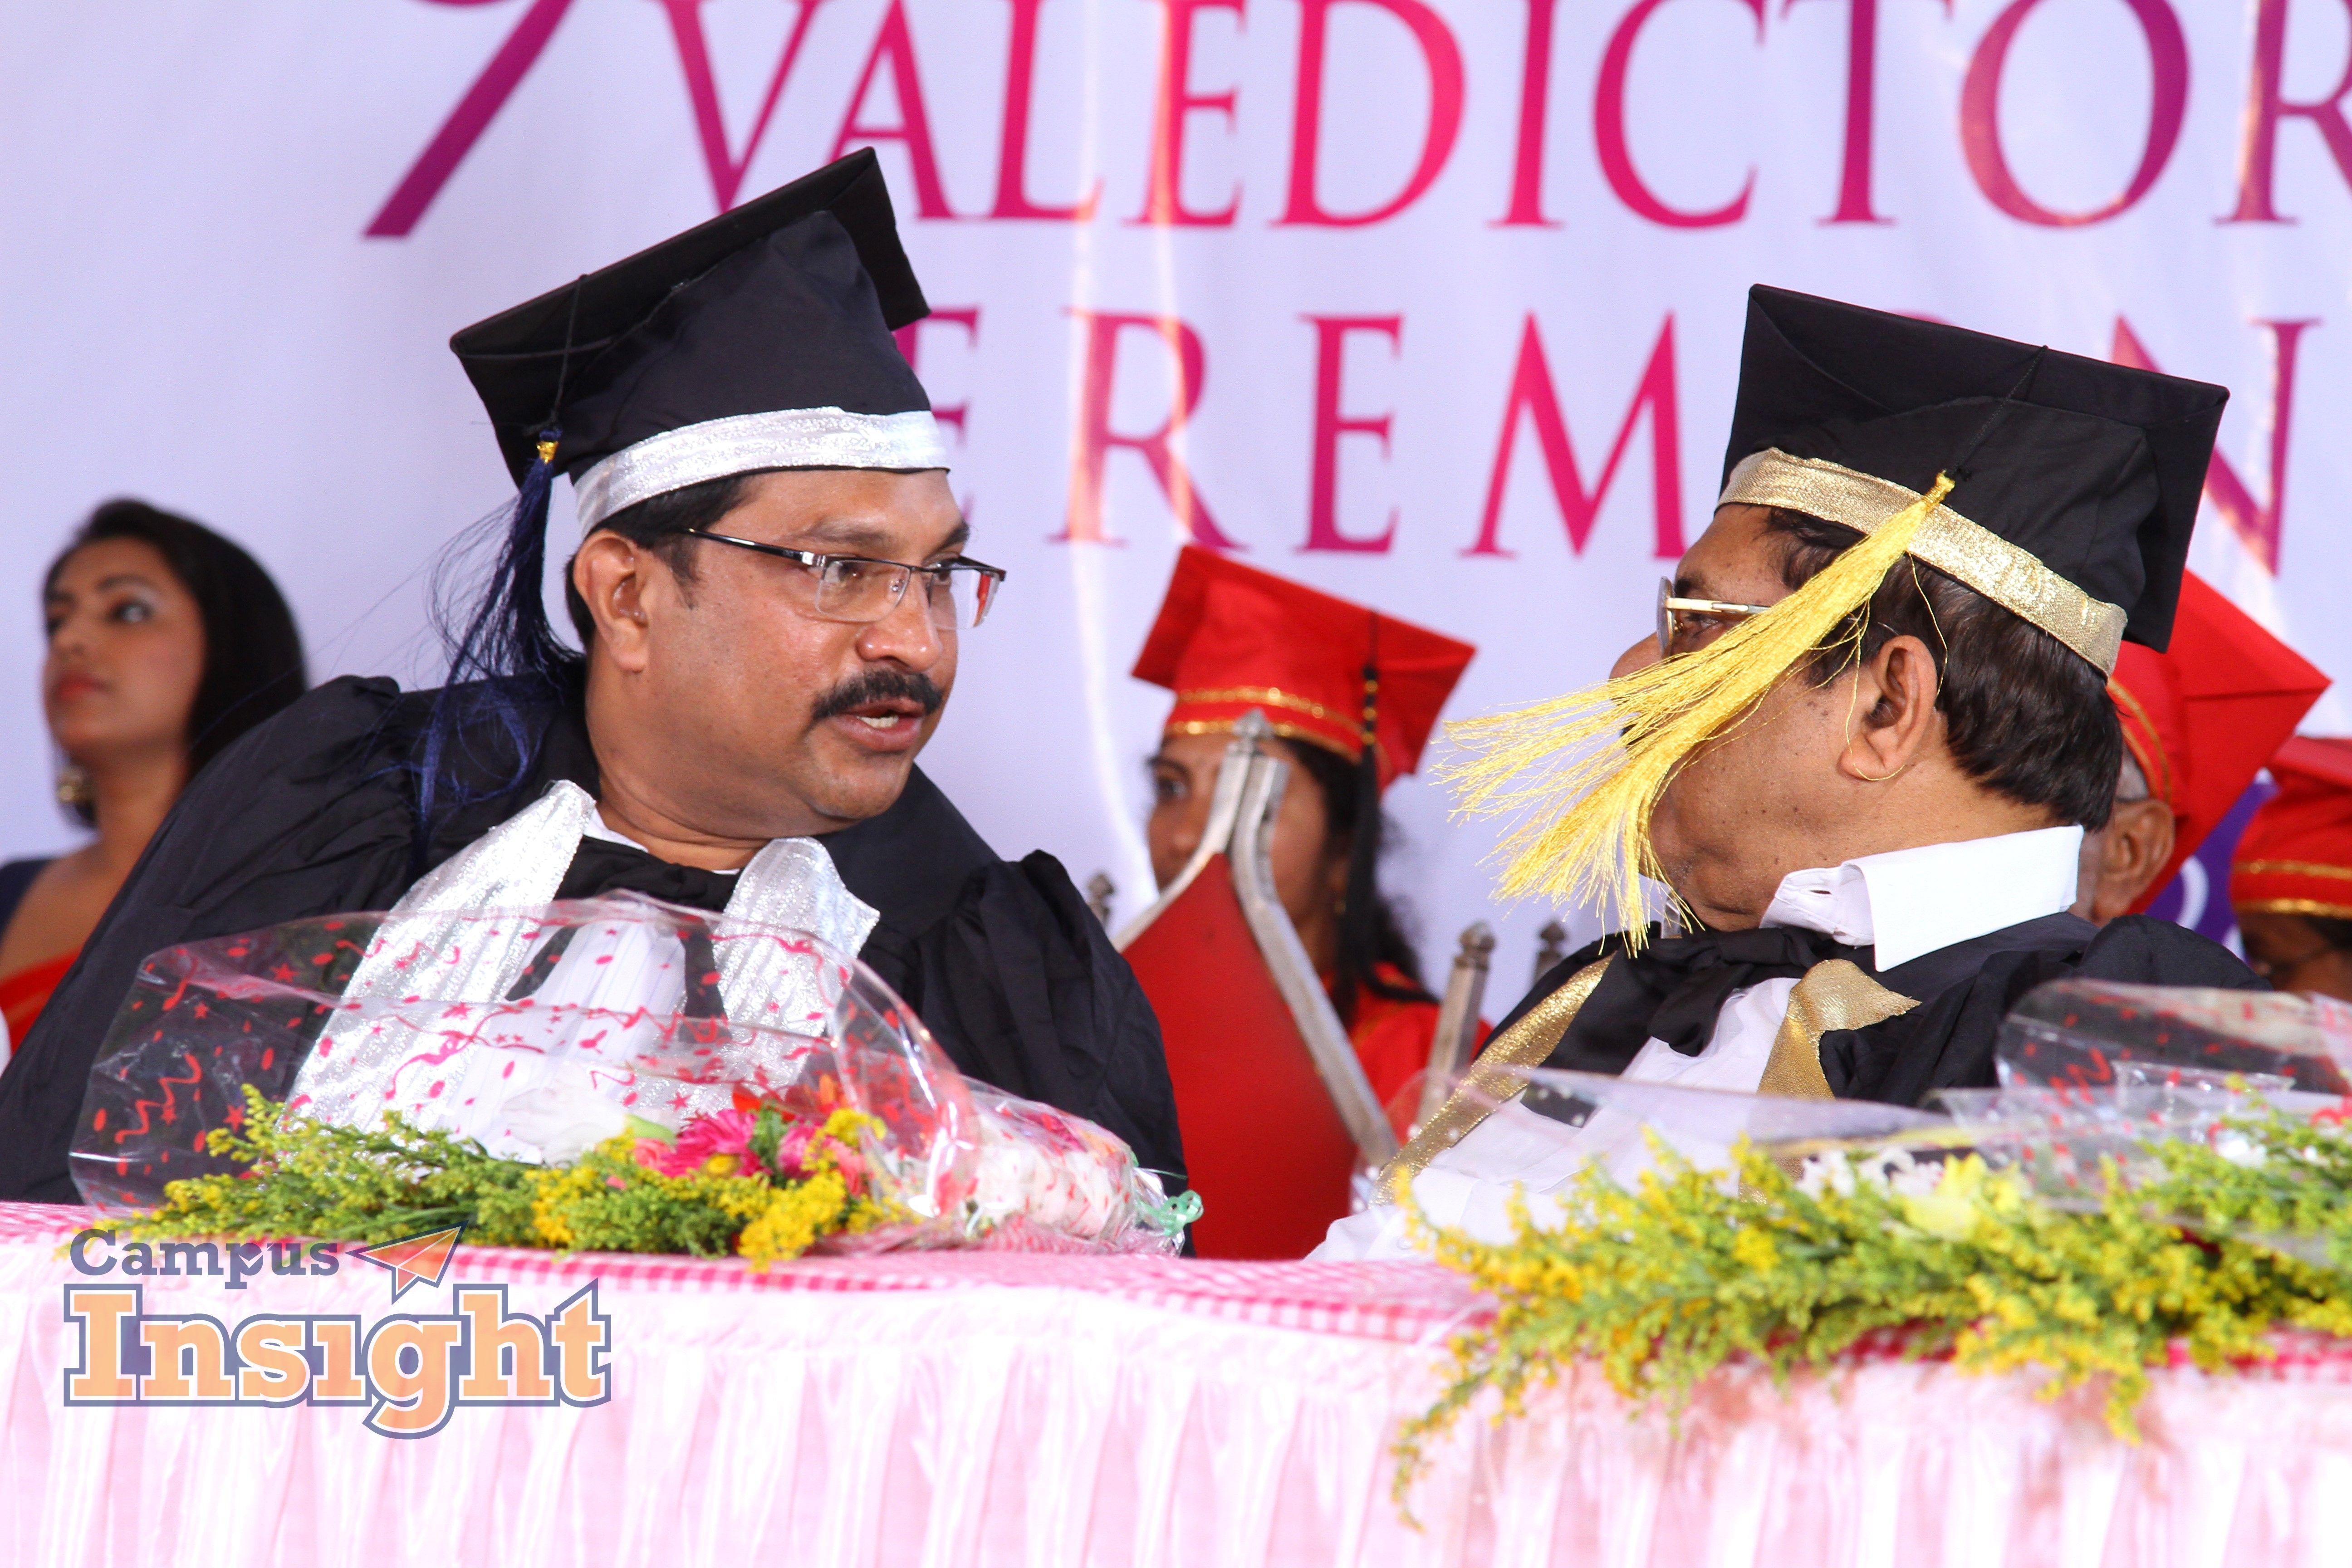 Chairman Academic dress, College, Insight